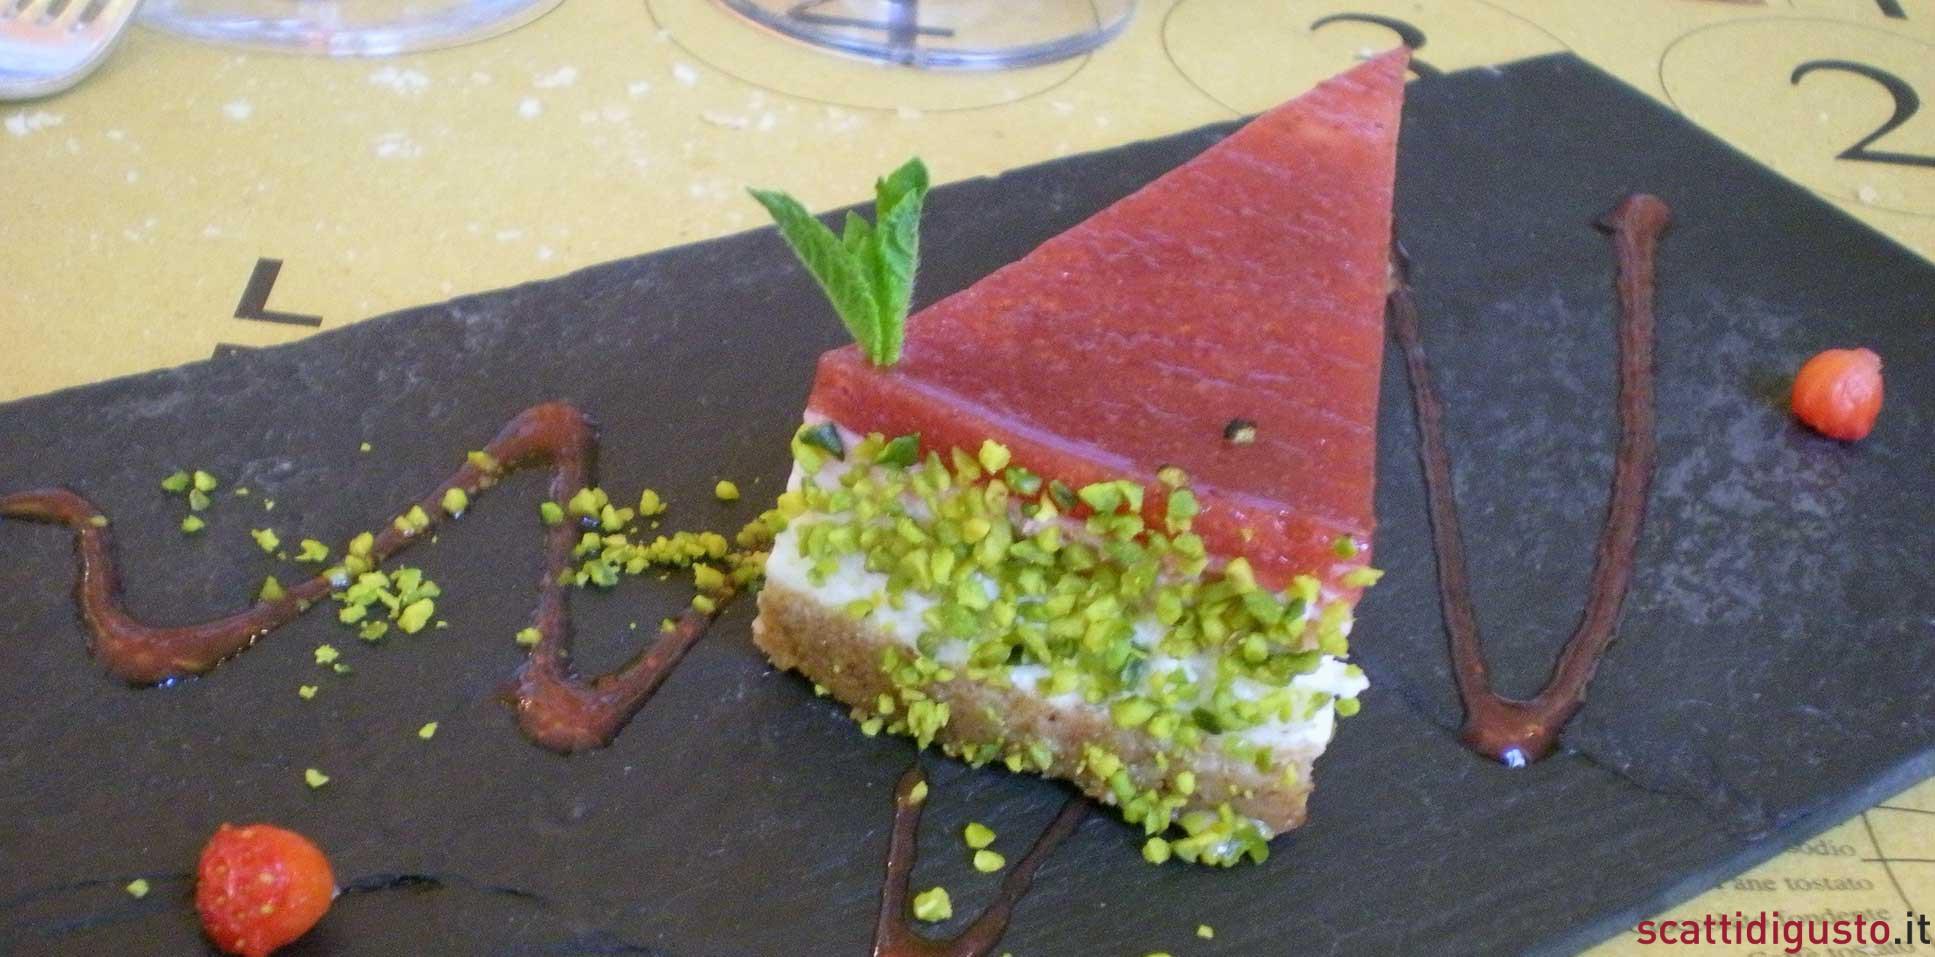 Enoteca-Leone-cheese cake